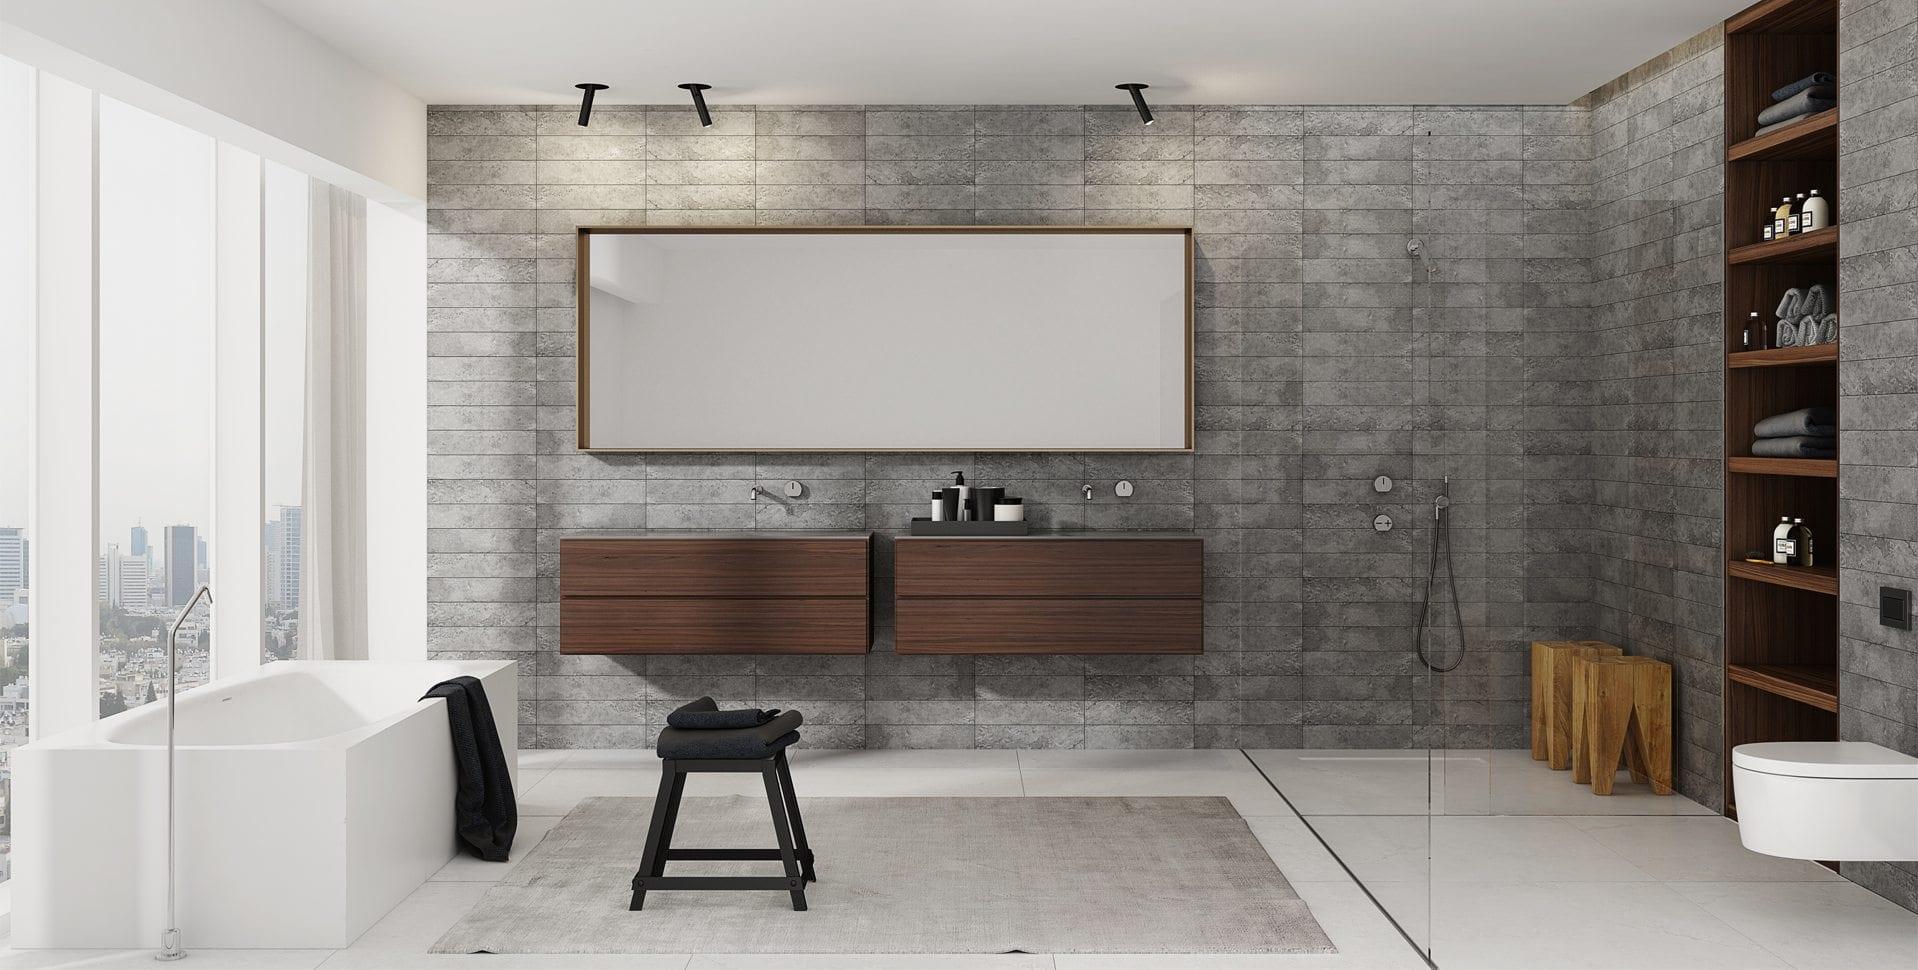 Maayan-Golan_Architectural-Visualization_ penthouse-interior-visualization_bathroom_ design-itzik-eini_03